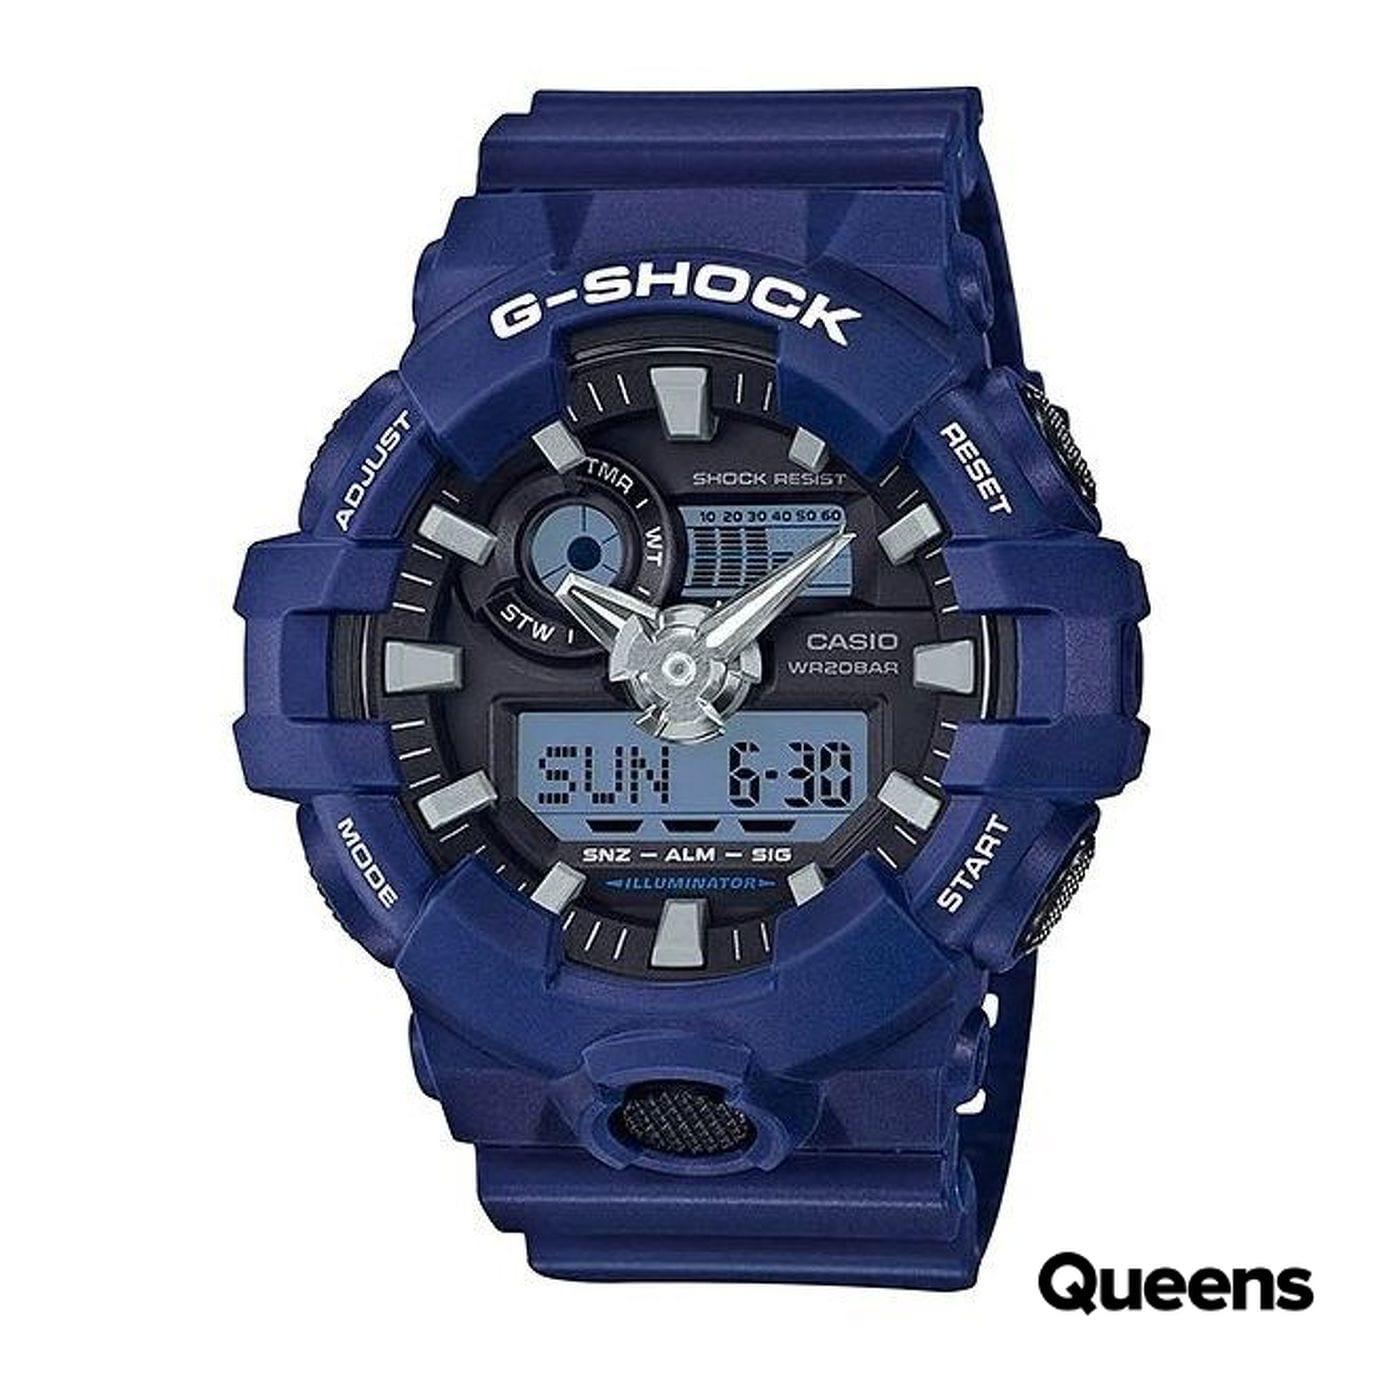 Pánské i dámské hodinky – Stránka č. 4 – Queens 💚 a2d351fbf2